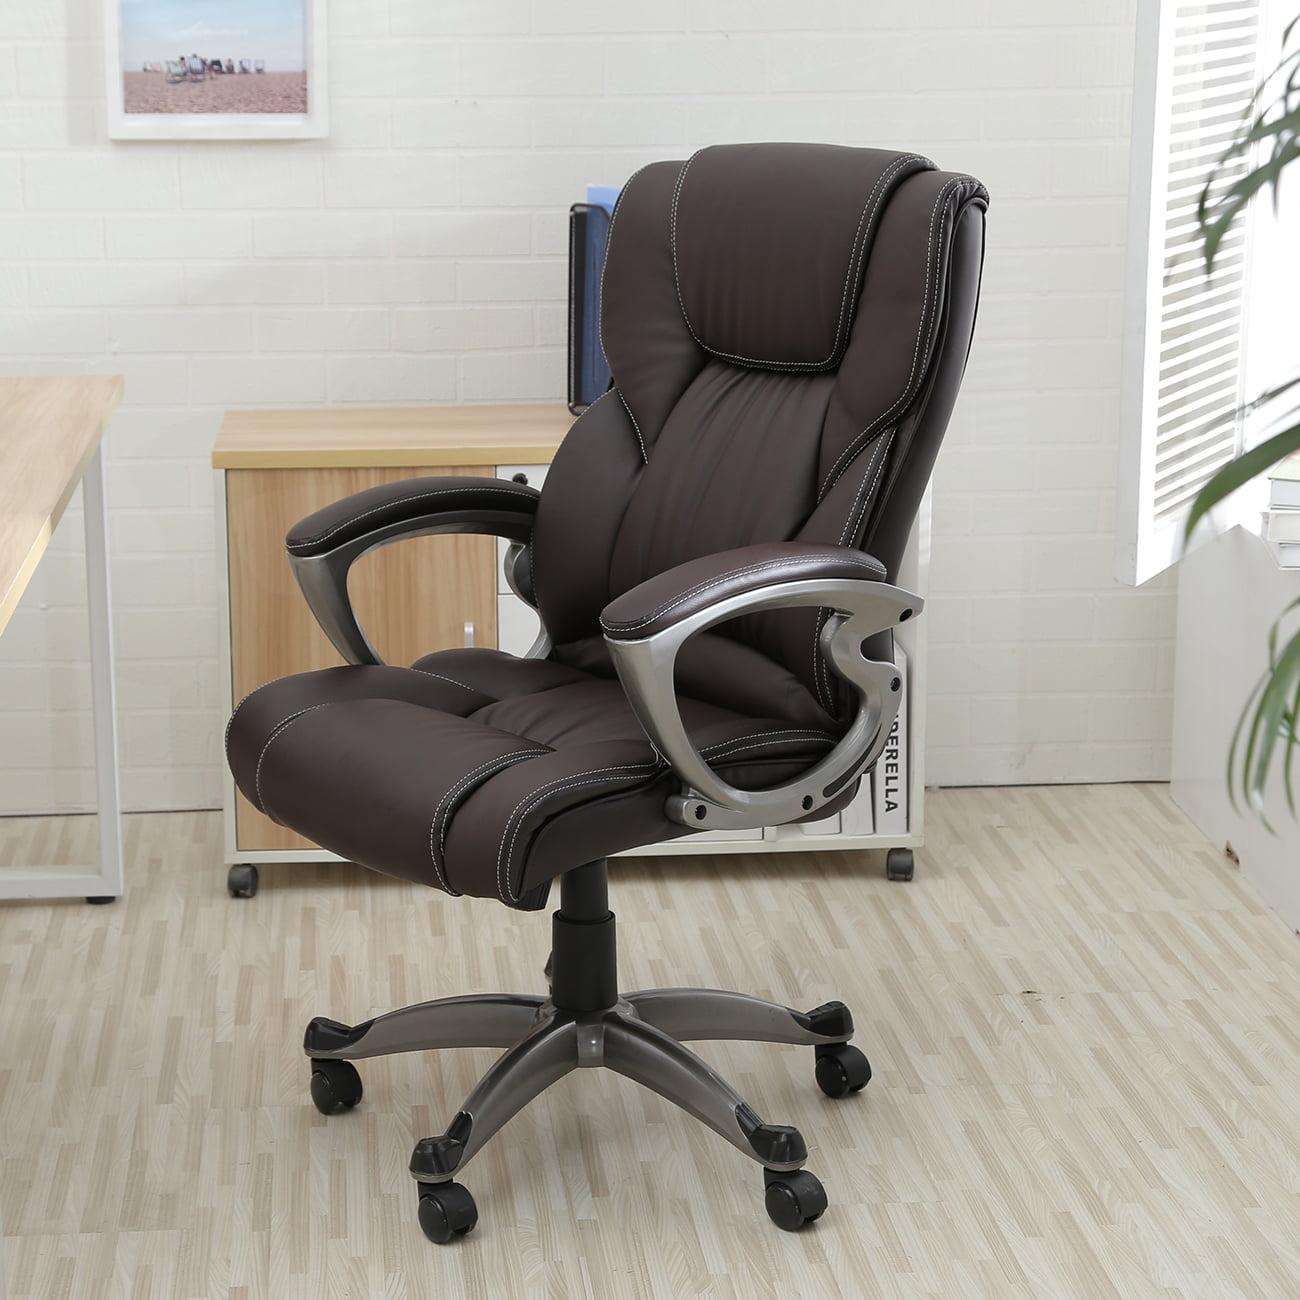 Cool Belleze Executive High Back Leather Chair Desk Comuter Task Room Brown Walmart Com Theyellowbook Wood Chair Design Ideas Theyellowbookinfo